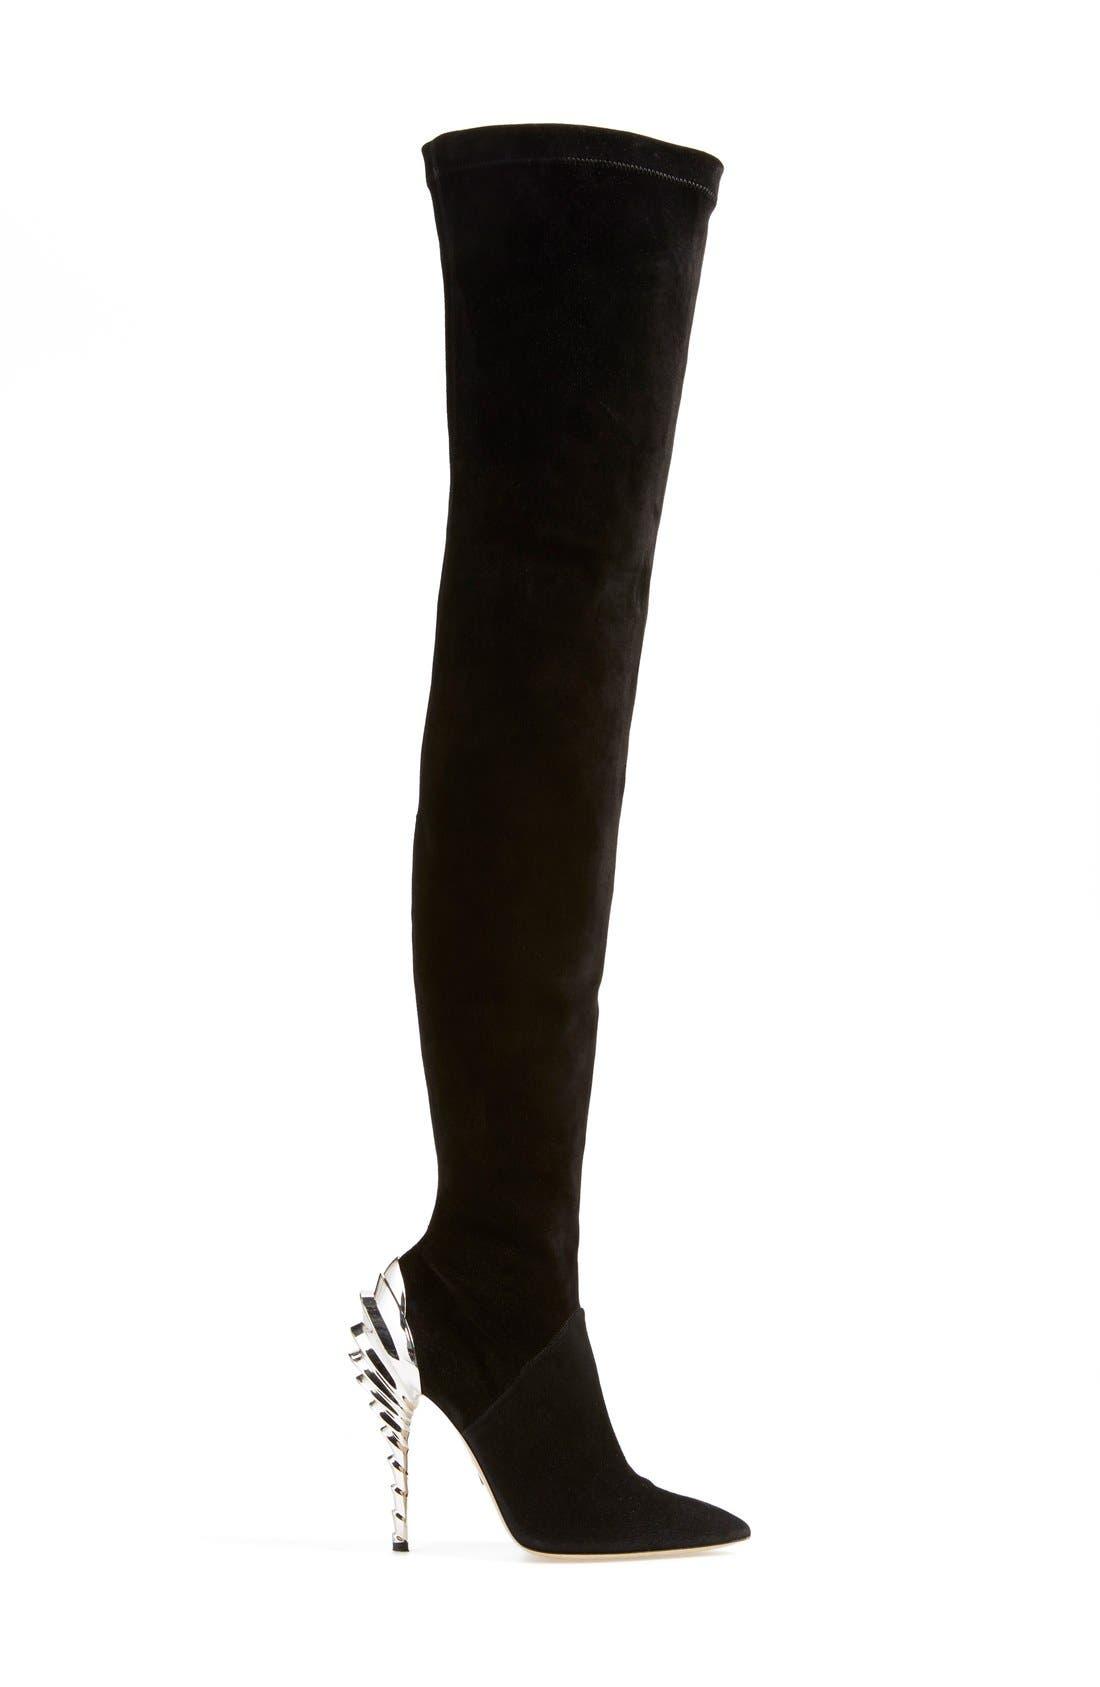 Alternate Image 4  - Paul Andrew 'Chrysler' Thigh High Boot (Women) (Narrow Calf)